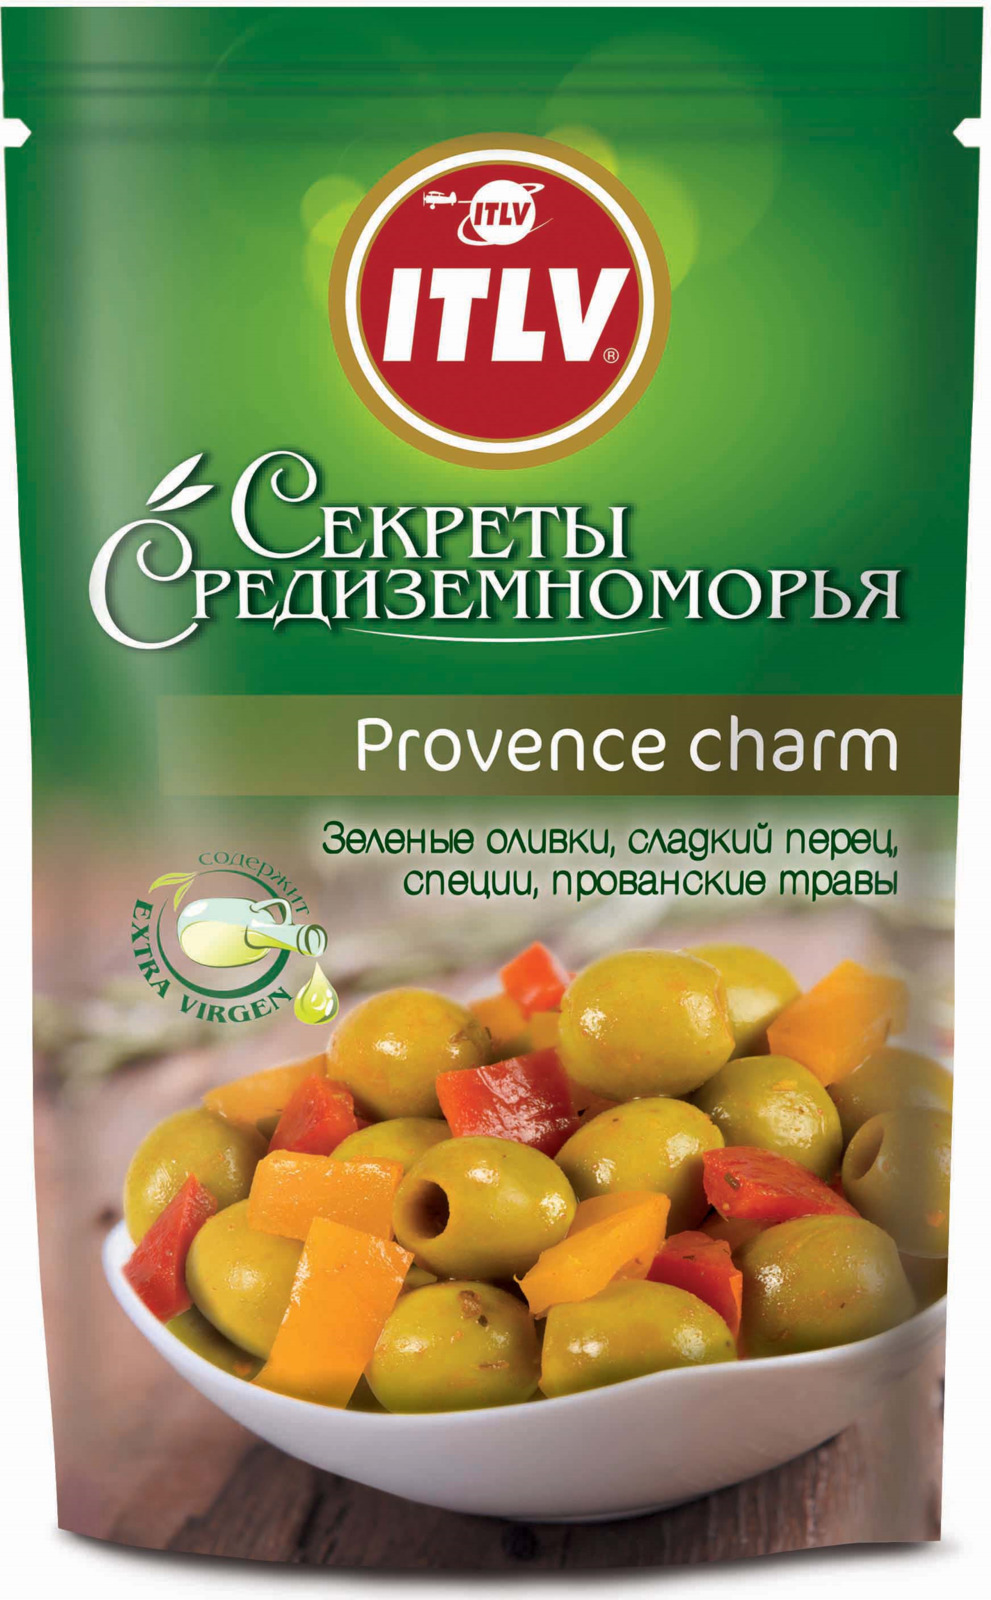 Ассорти оливок и маслин ITLV Provence Charm, 350 г